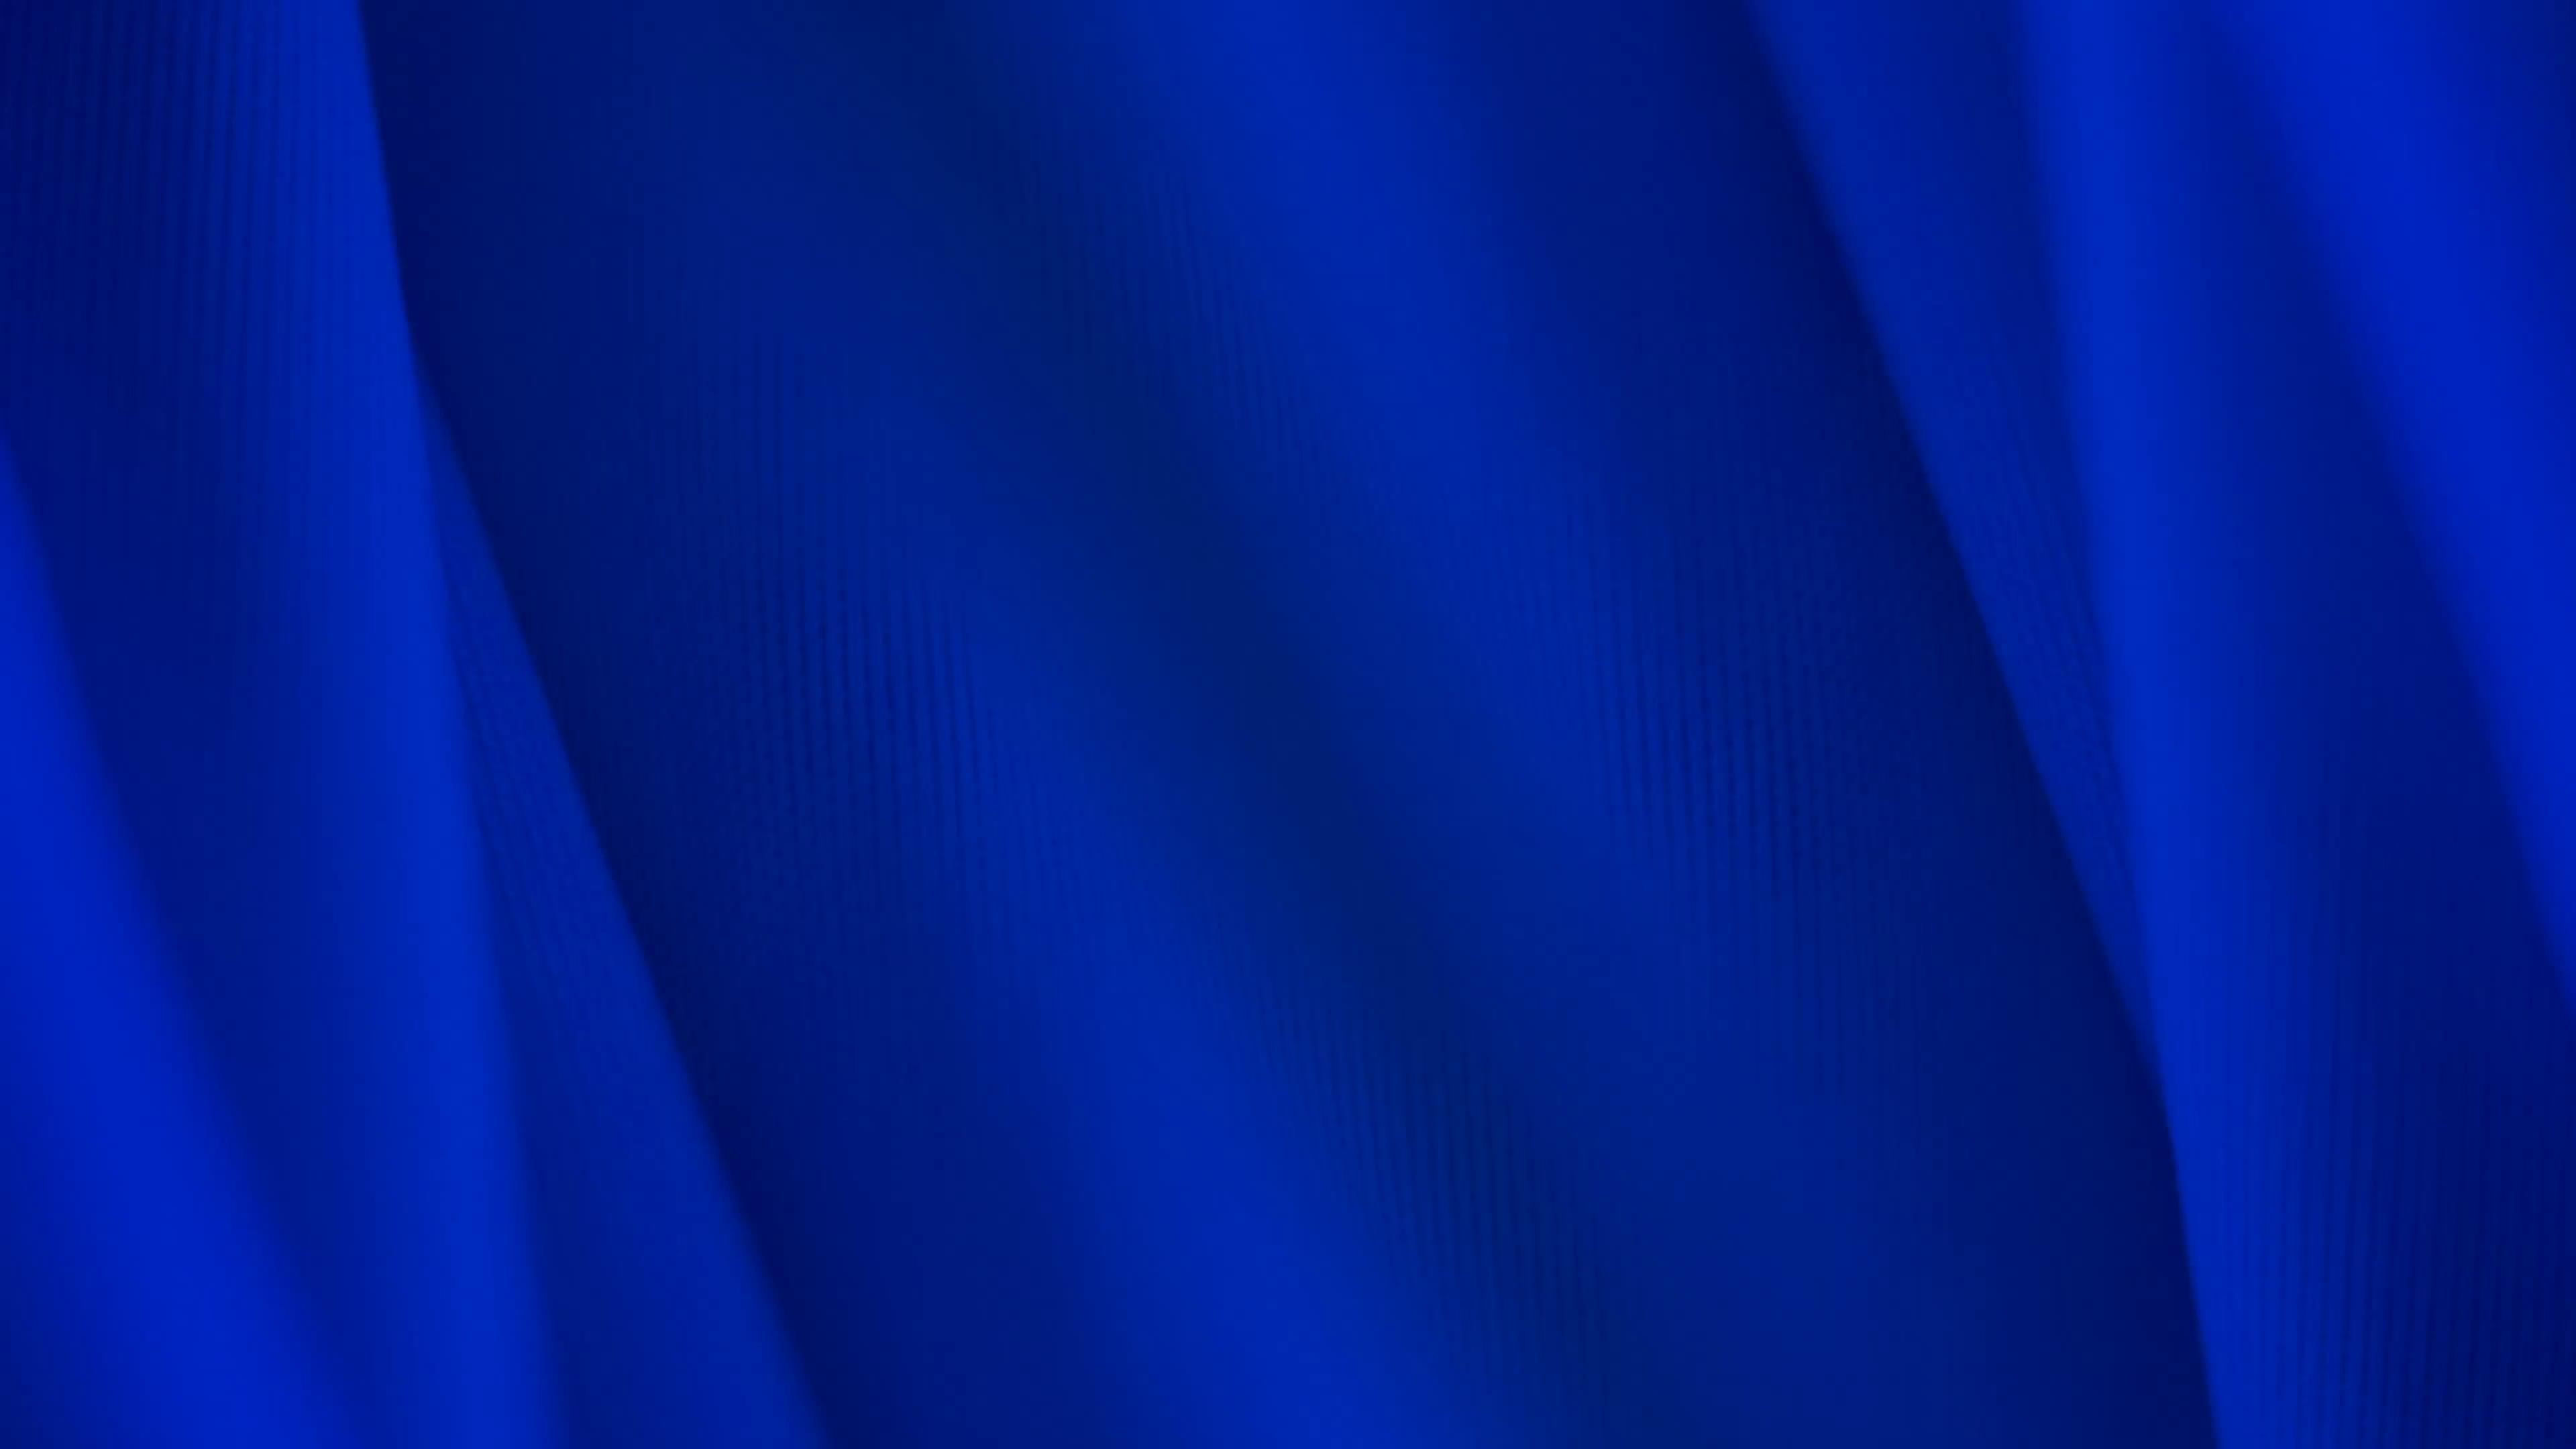 Image Result For Dark Blue Sky Wallpaper Blue Sky Wallpaper Blue Sky Wallpaper